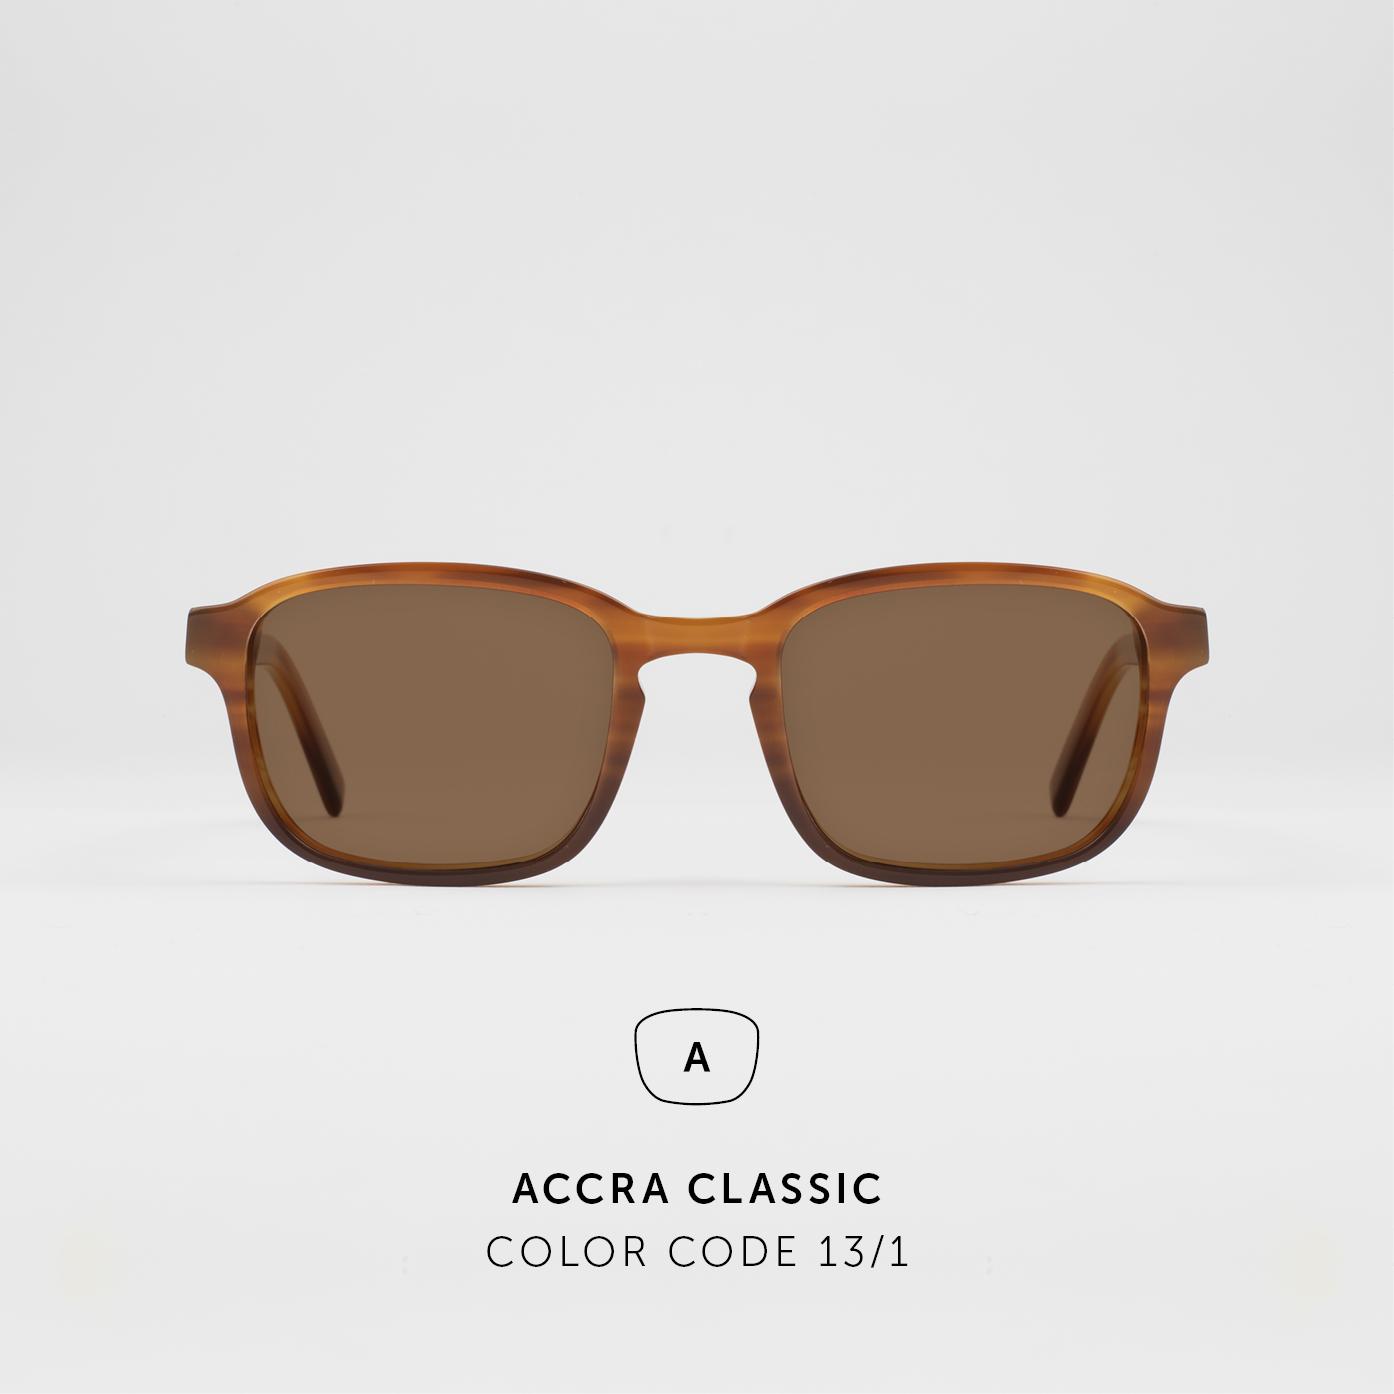 AccraClassic46.jpg